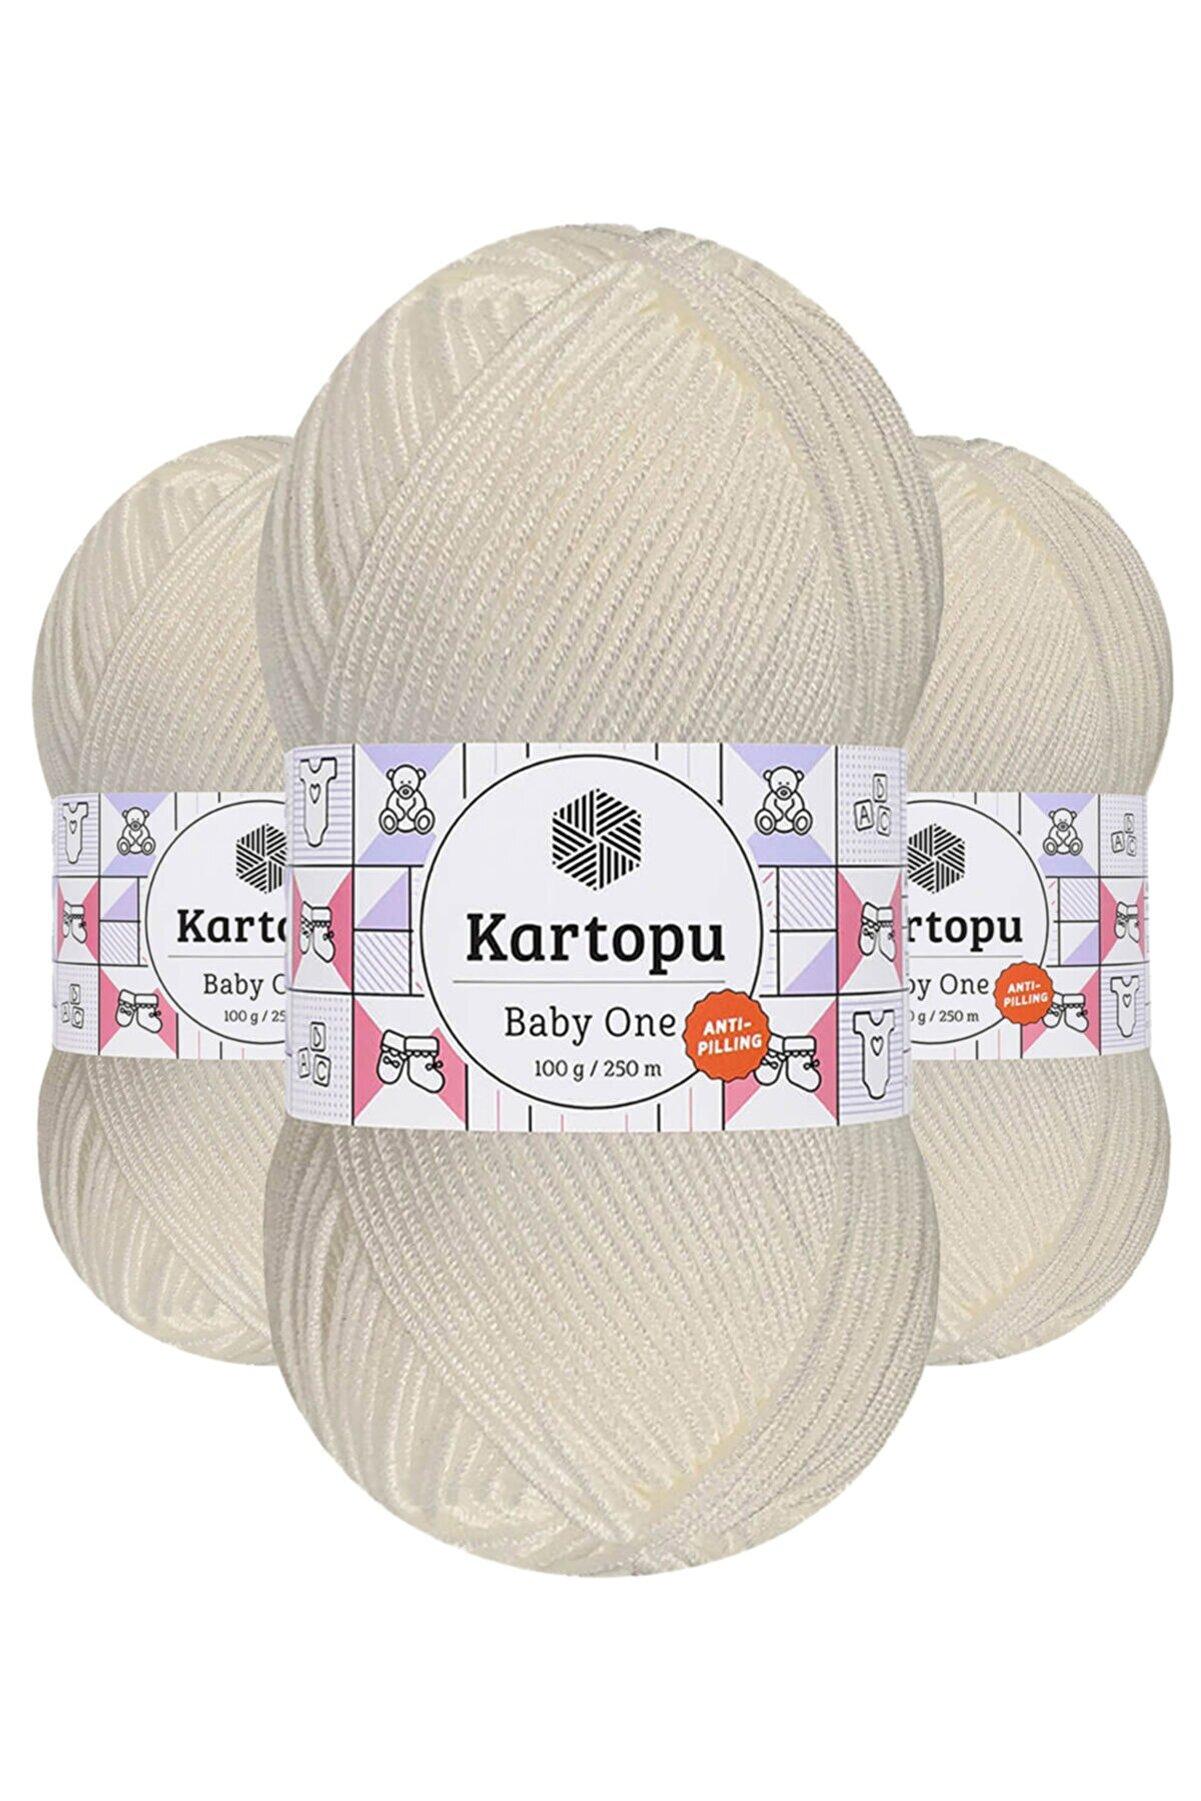 Kartopu Baby One K019 (kırık Beyaz) Anti-pilling El Örgü Ipi/yünü 1 Adet